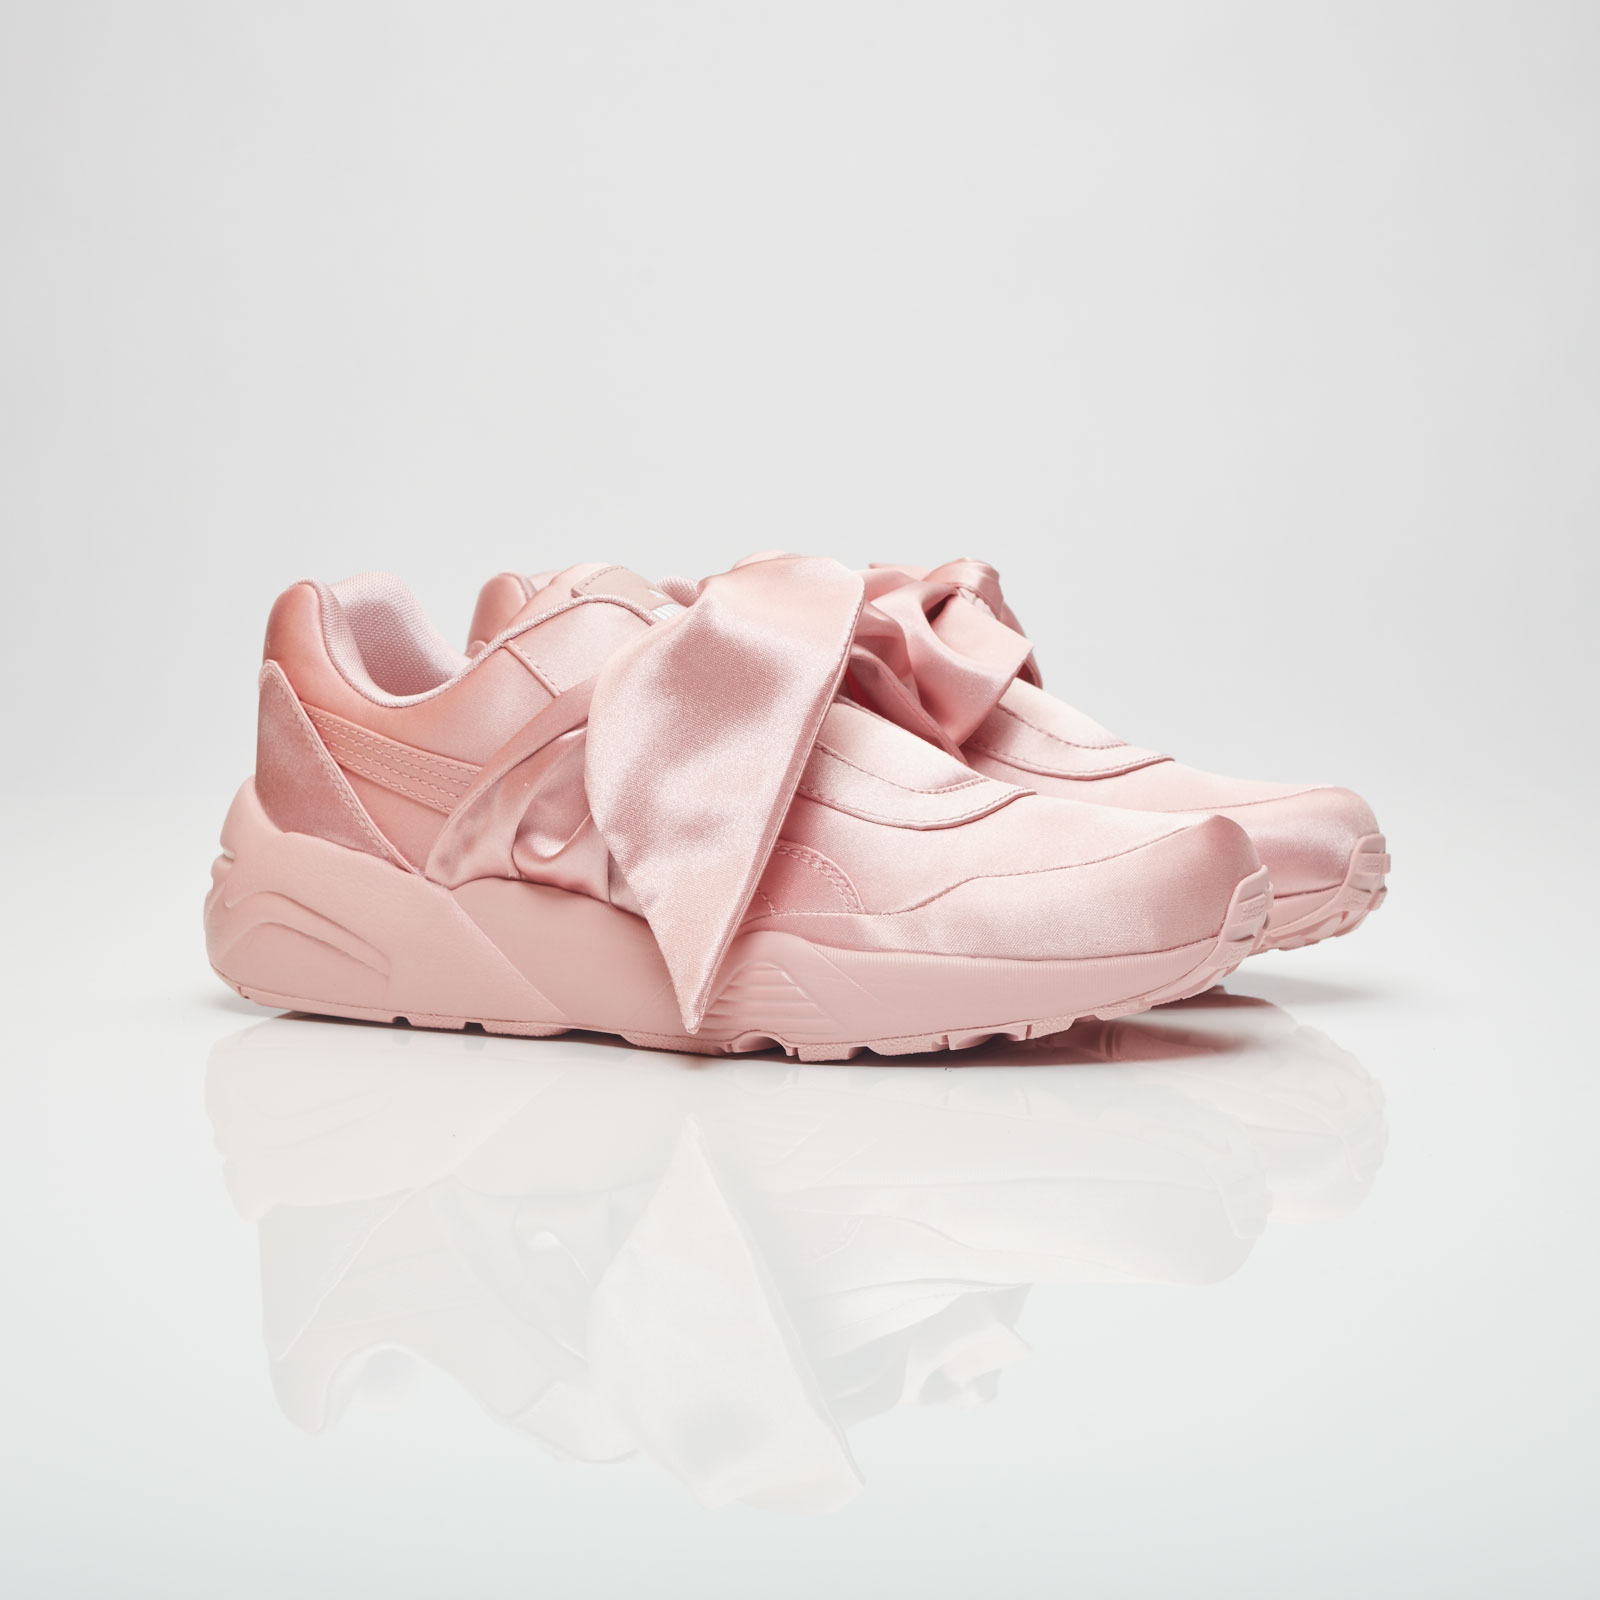 efd21b5e2708 Puma Bow Sneaker Womens - 365054-01 - Sneakersnstuff